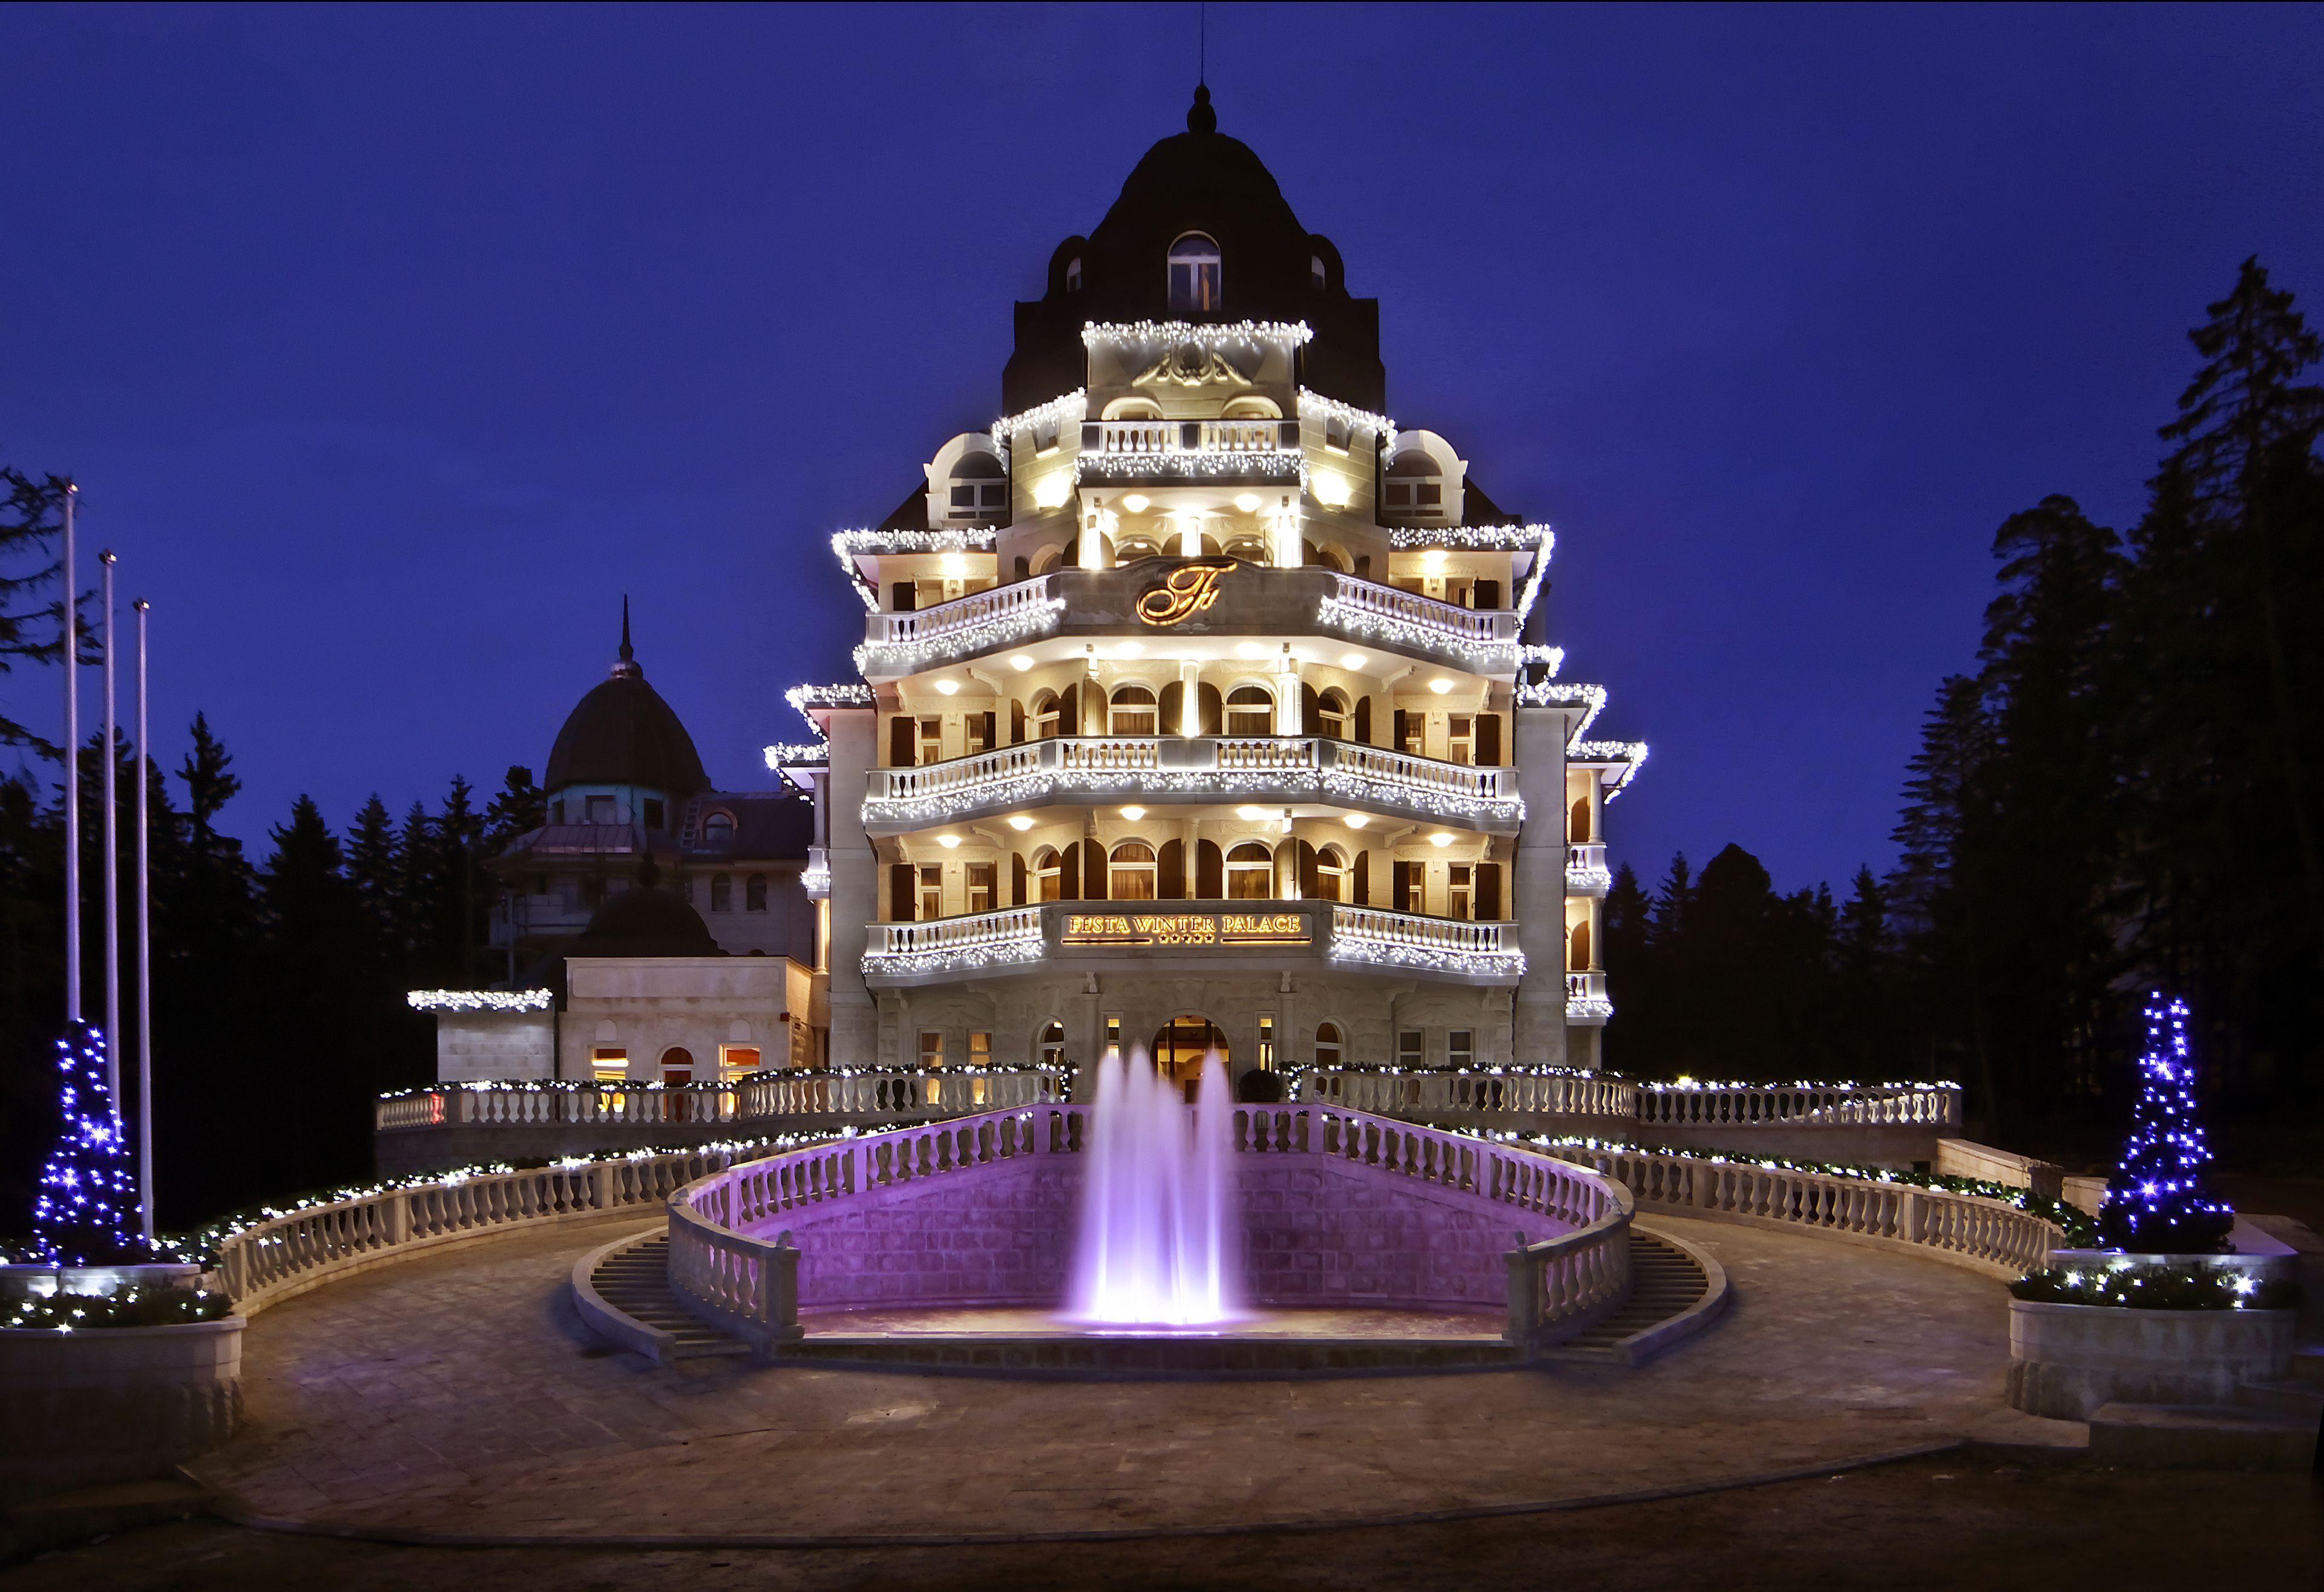 Courtesy of Festa Winter Palace / Expedia